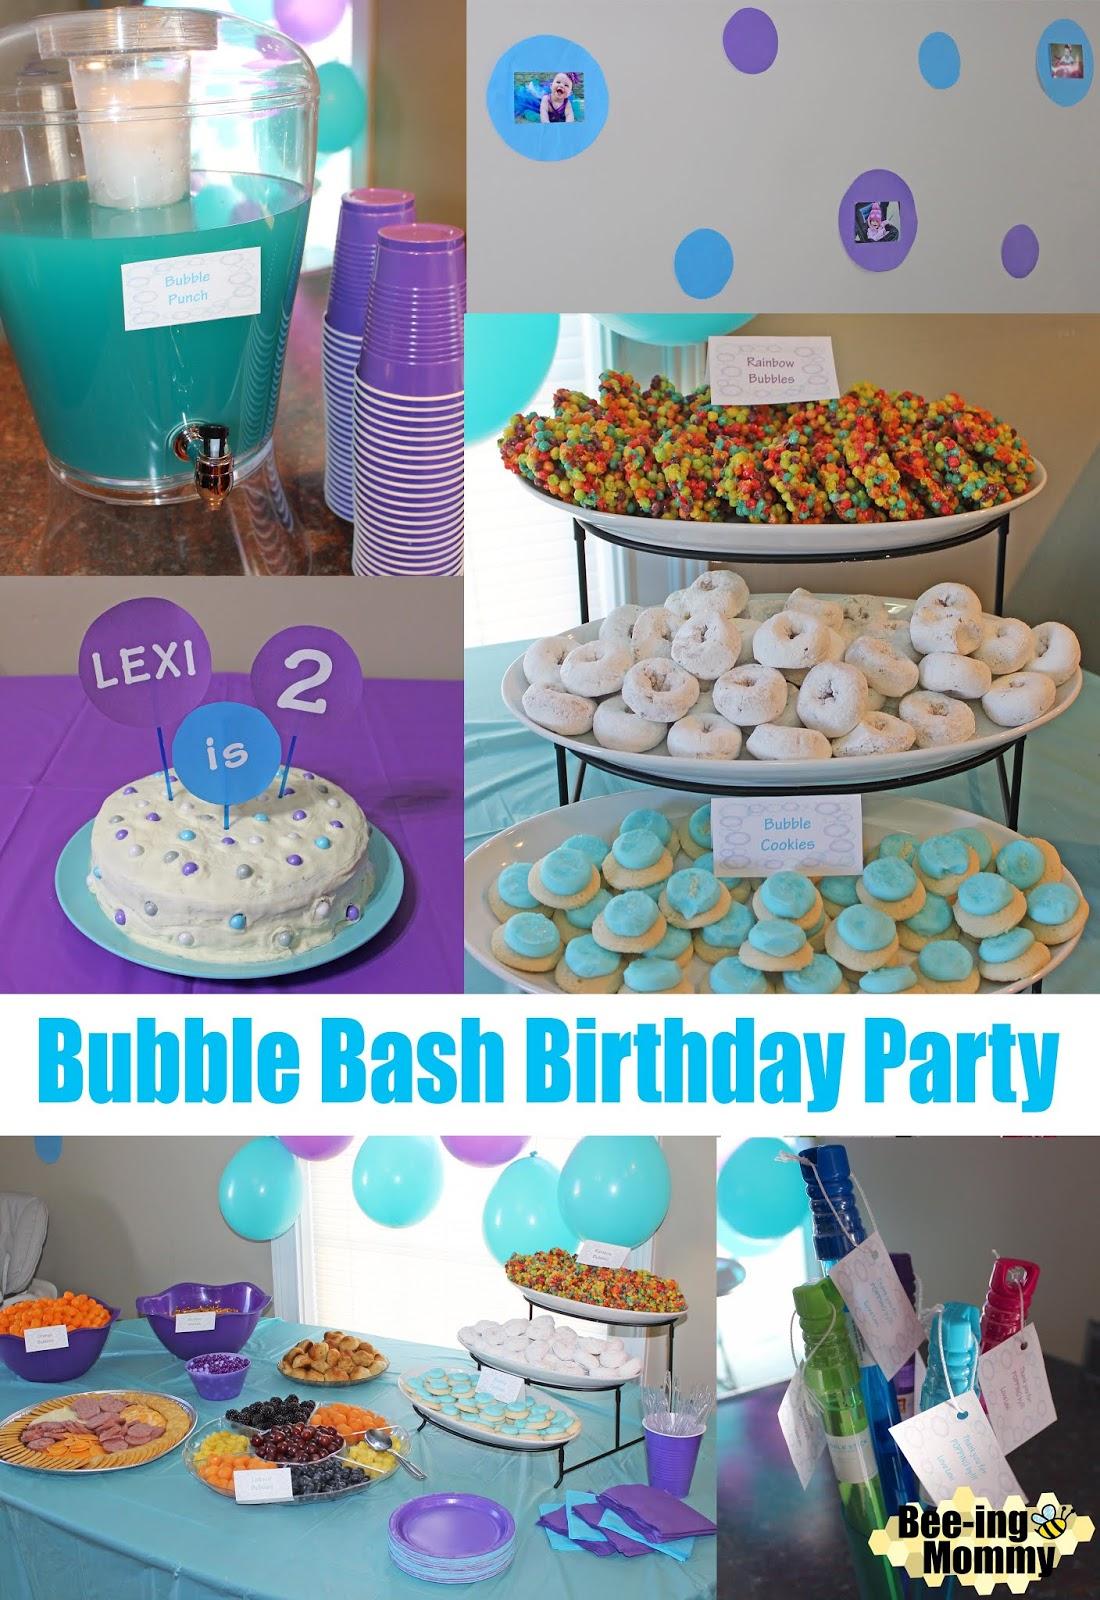 Bubble Bash Birthday Party